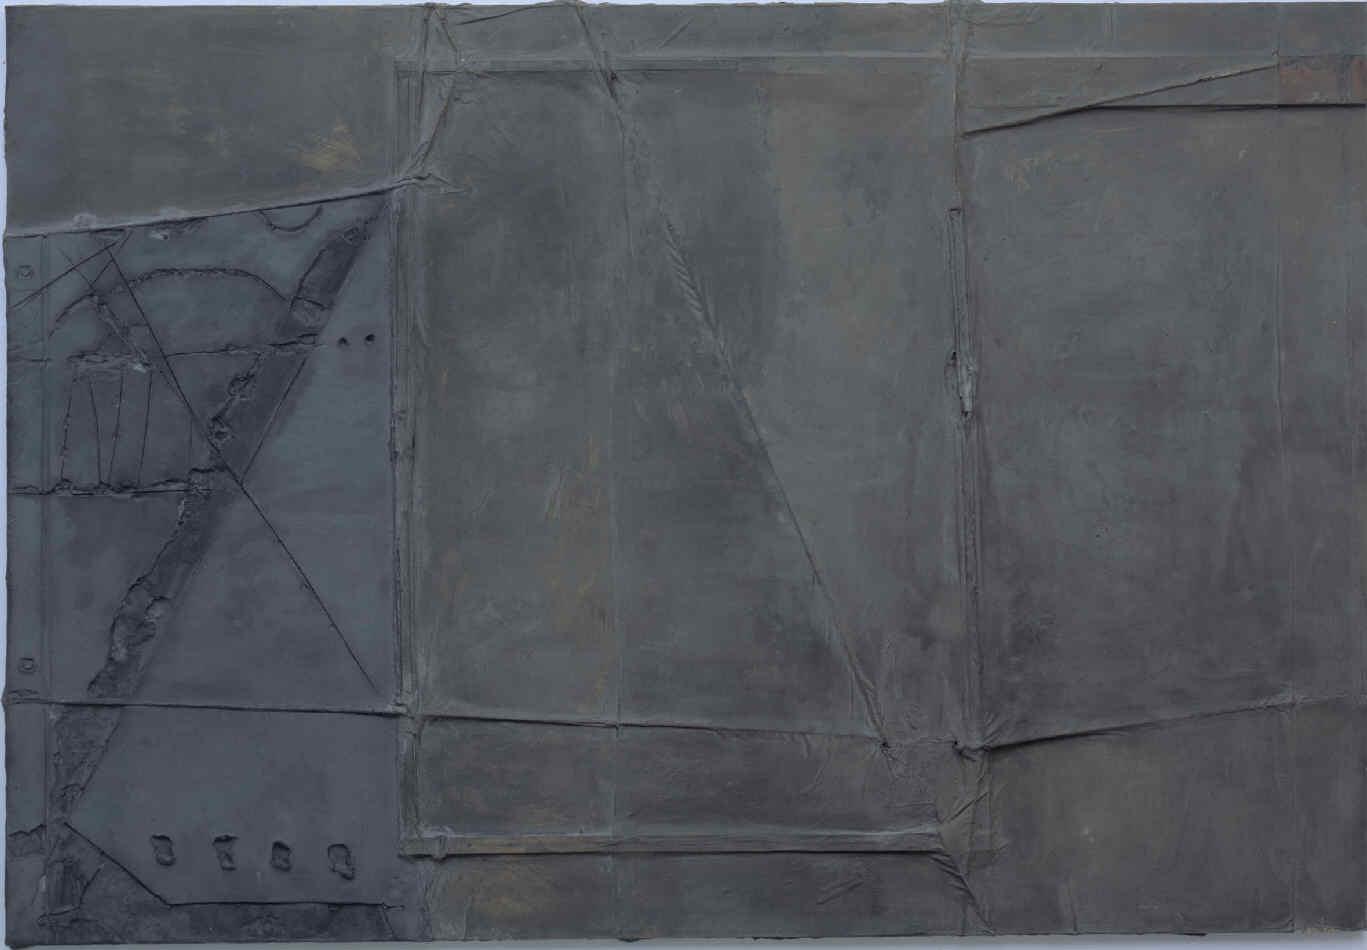 Grande toile grise pour Kassel [Gran tela gris para Kassel]